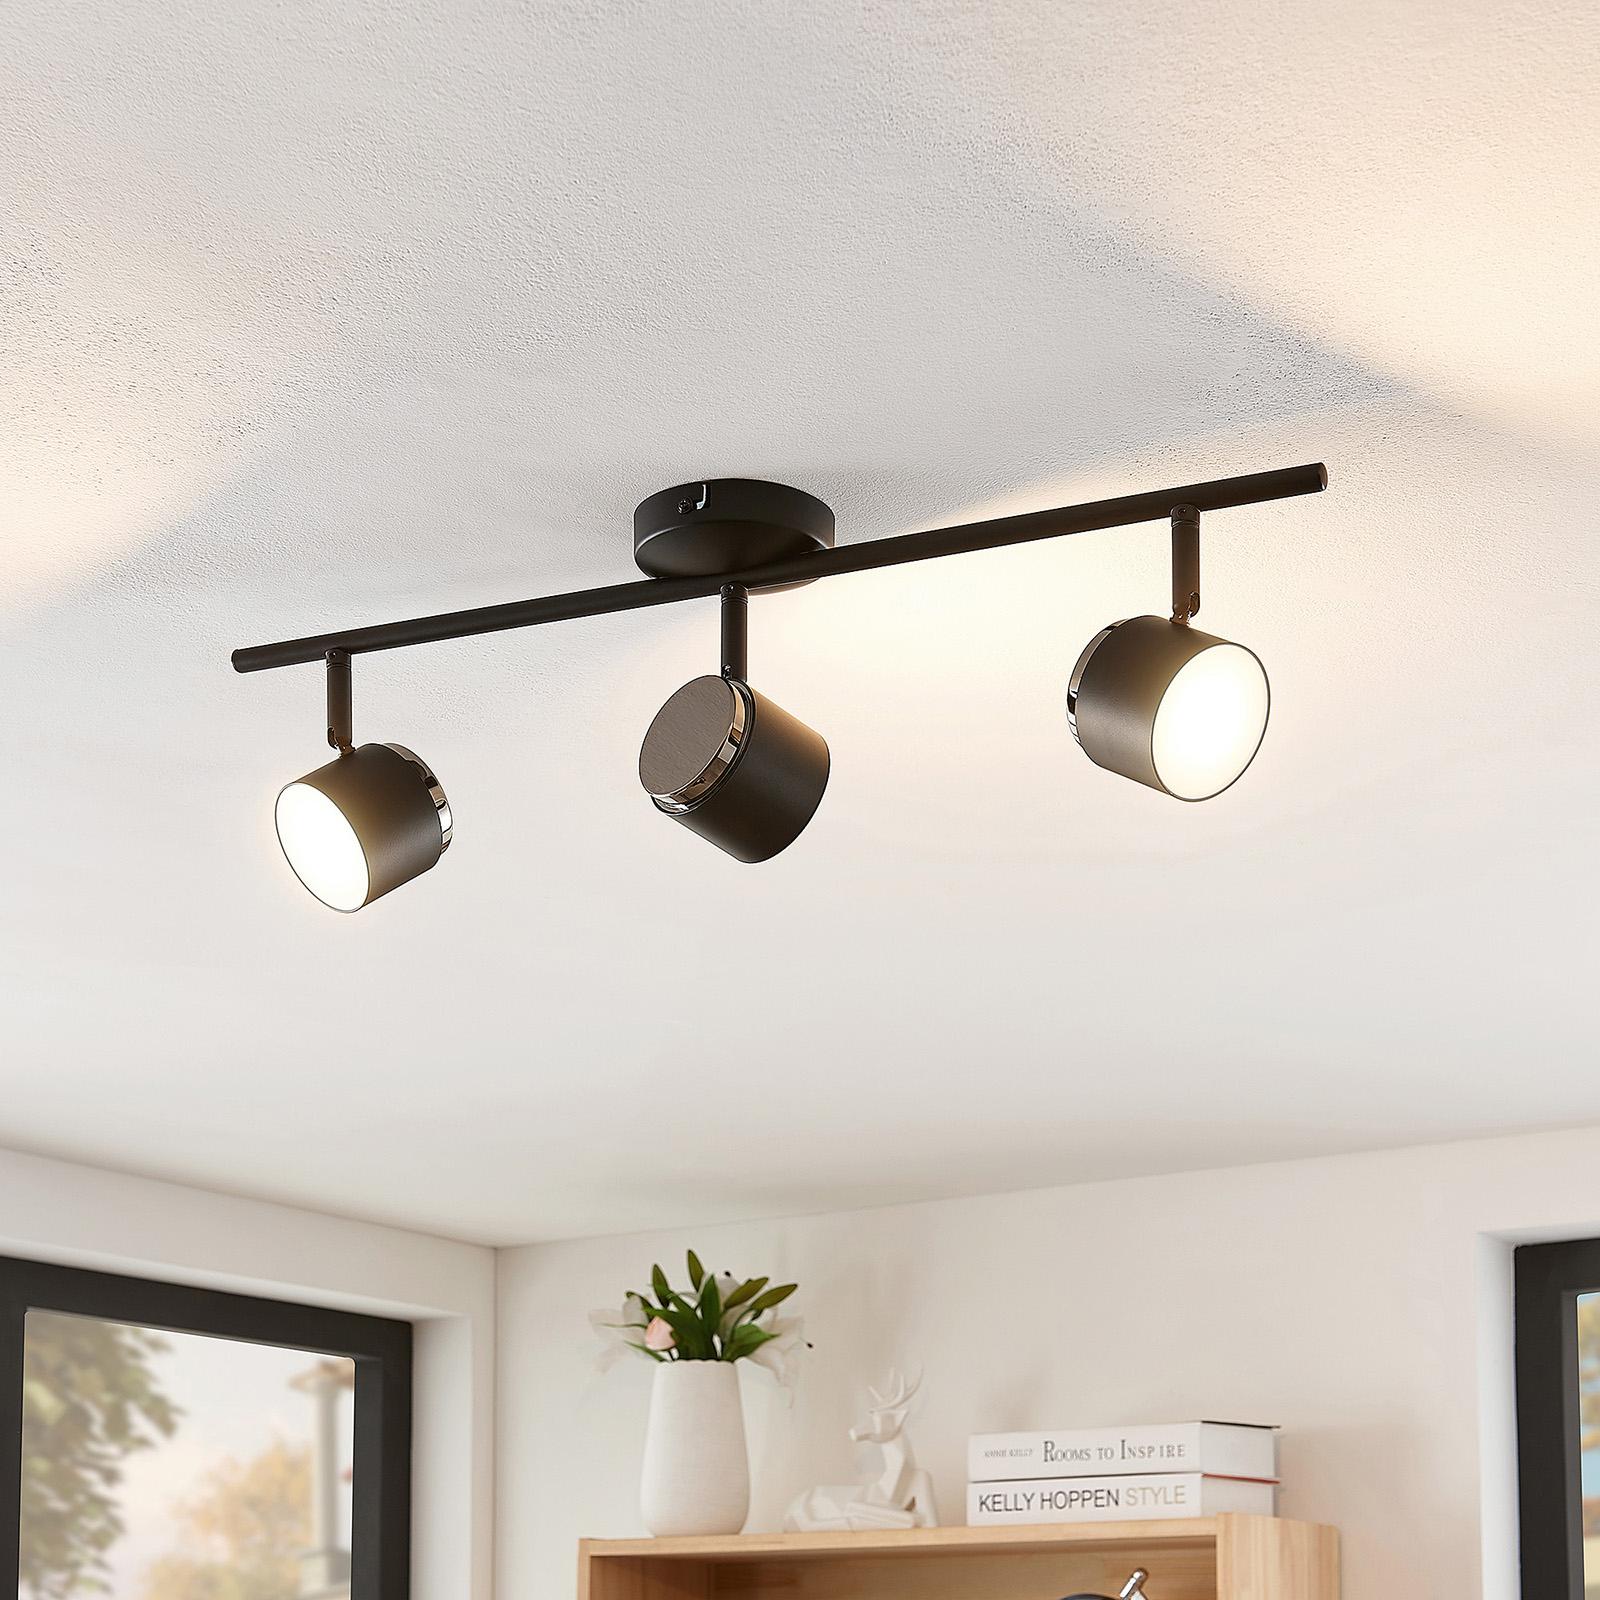 Lindby Marrie LED-Strahler, schwarz, 3-fl., Stange